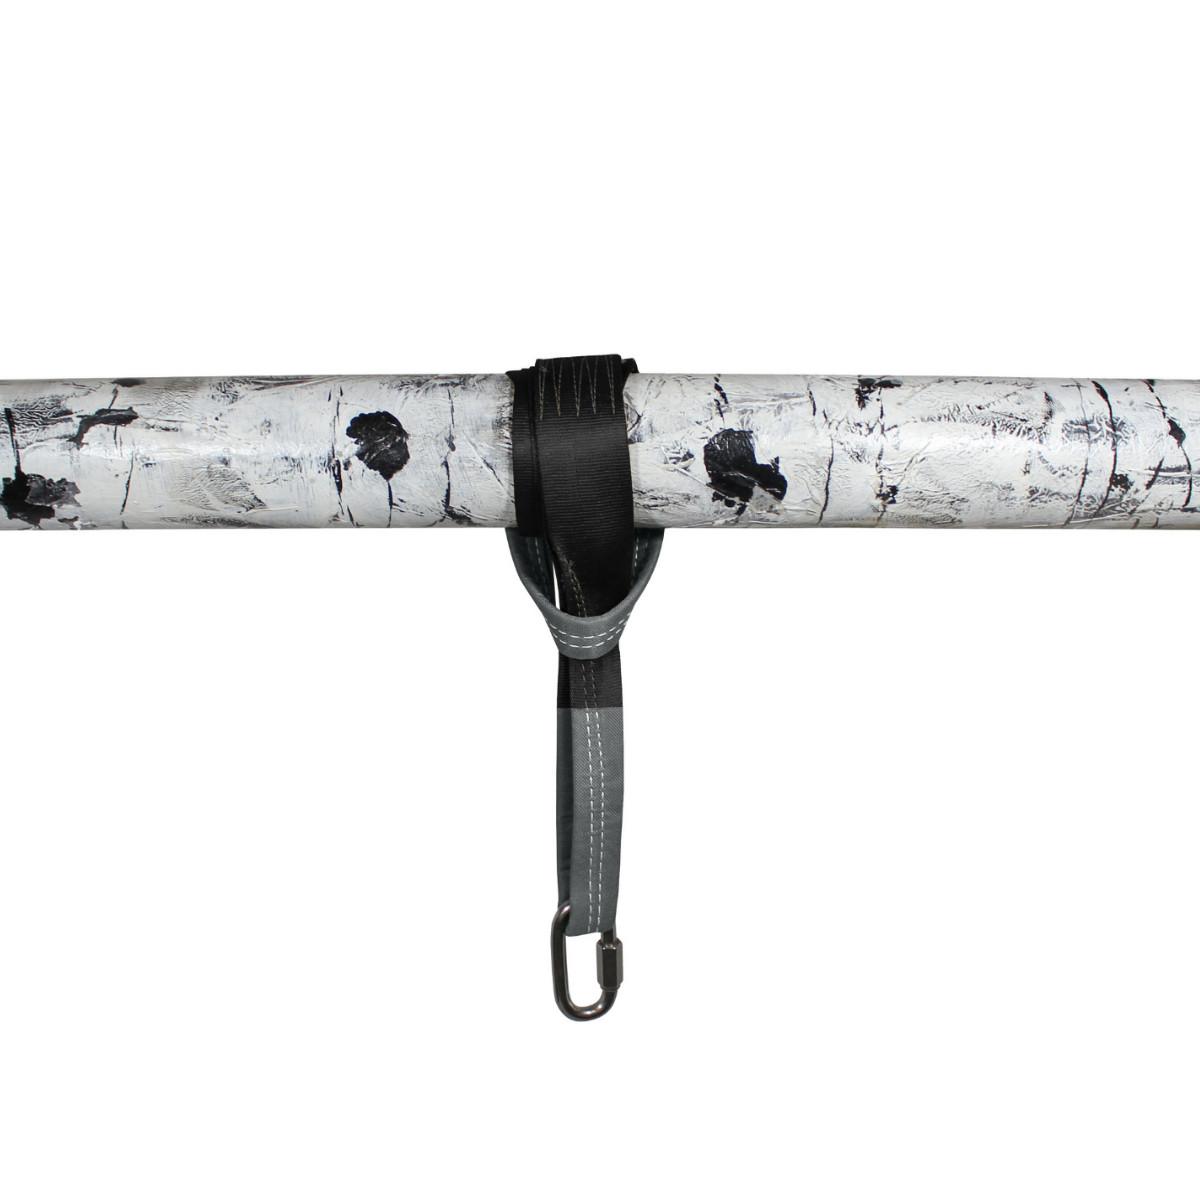 Sky Tree Hanger - Swing Strap for Tree Limbs